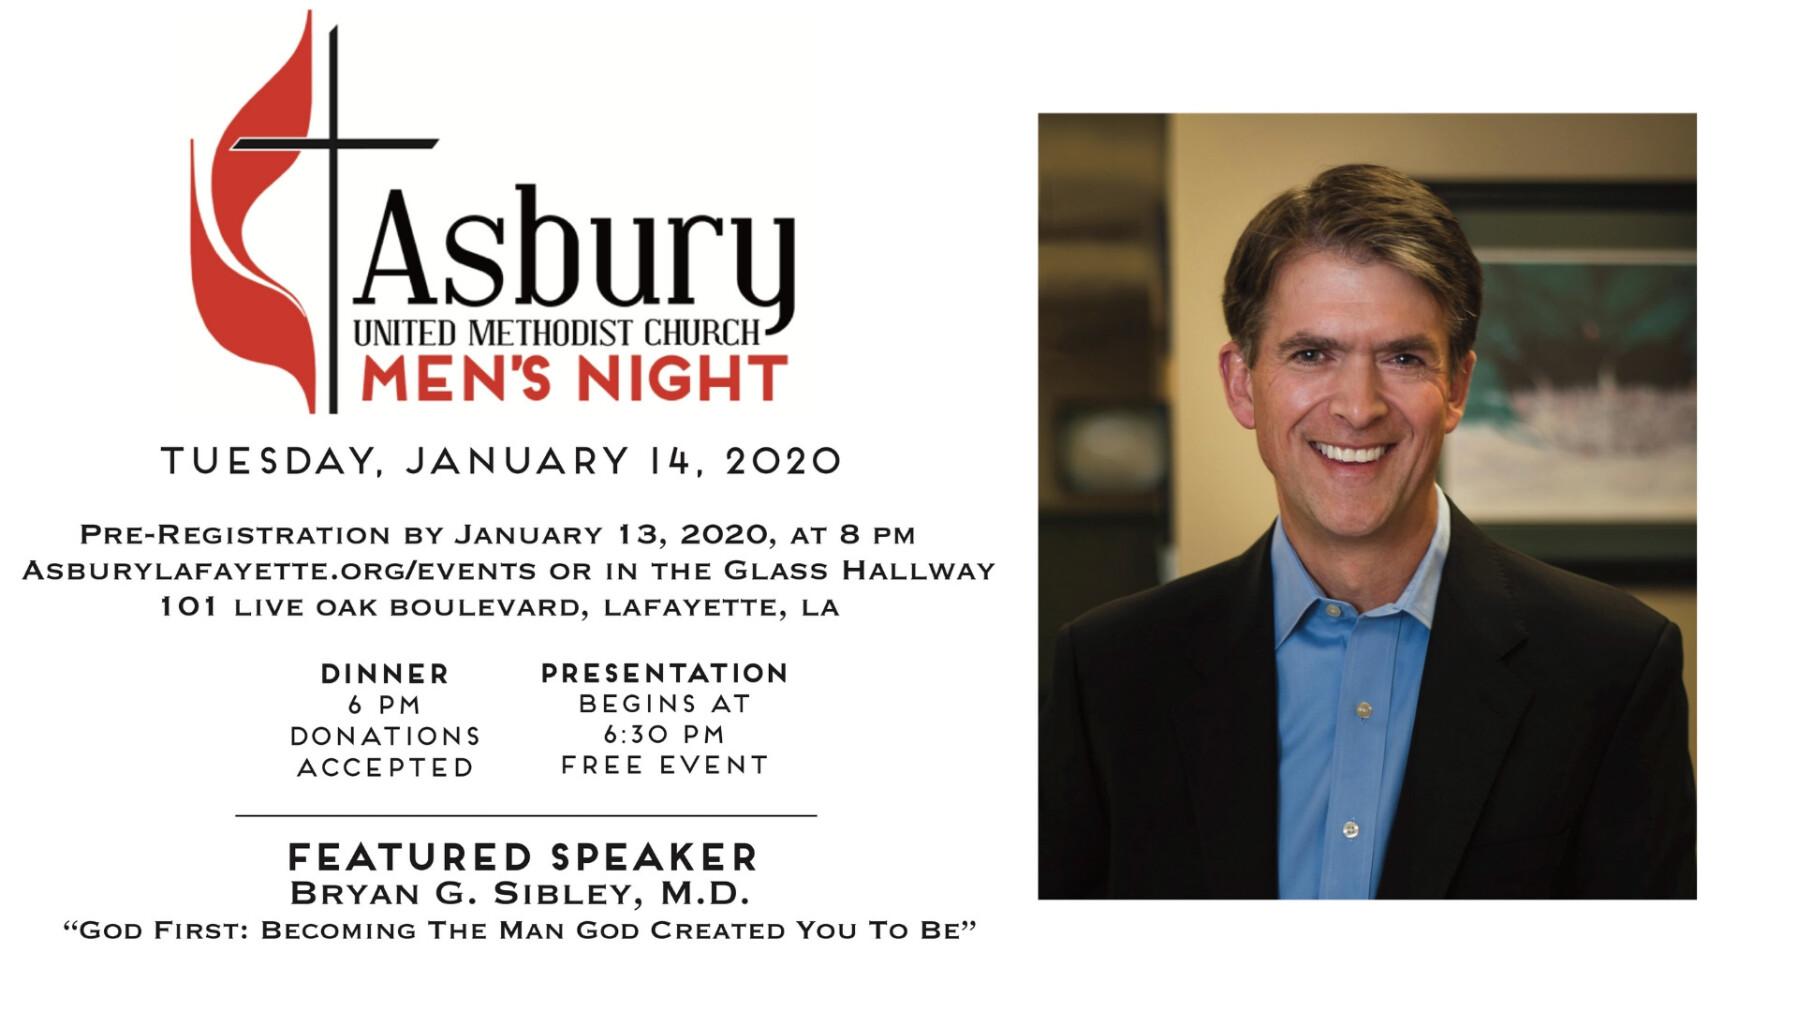 Asbury Men's Night